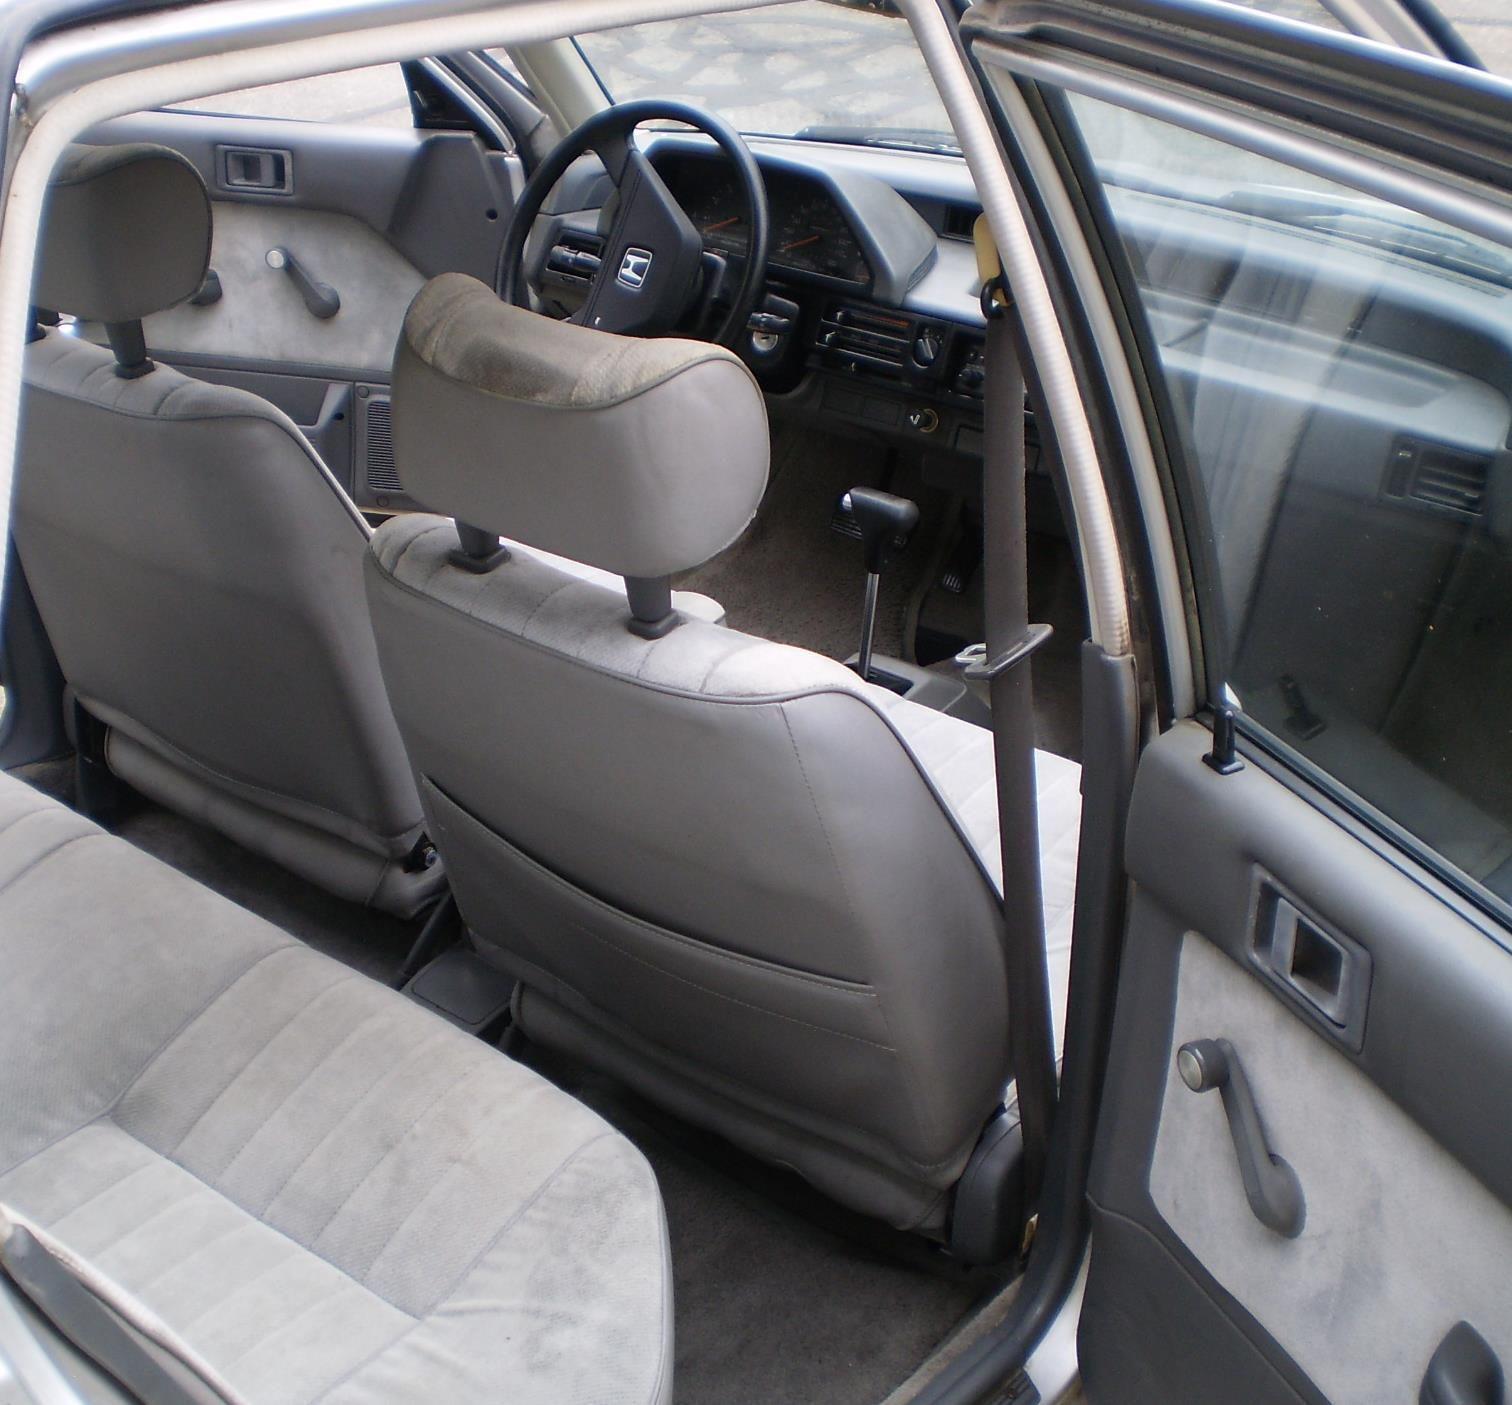 Honda Civic Sedan 1984 Older Classic